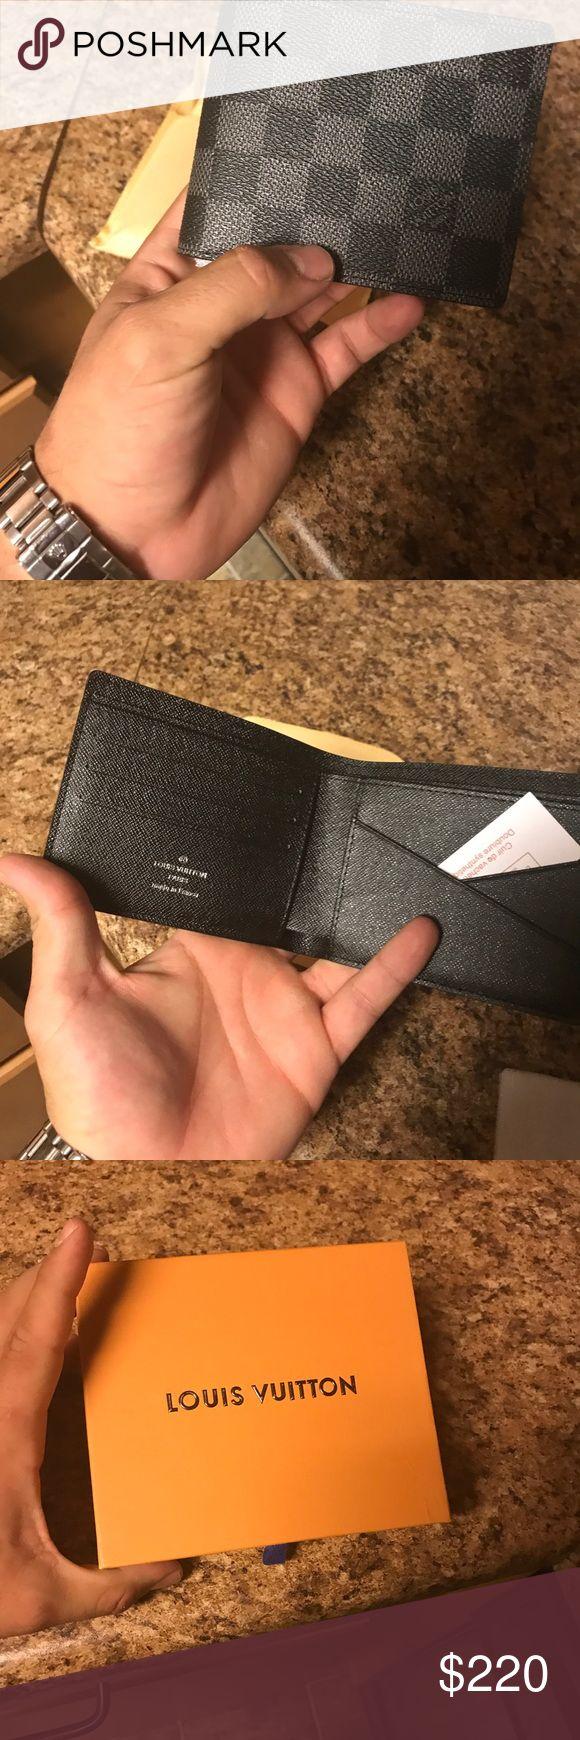 Louis Vuitton men's wallet Fresh wallet! Louis Vuitton Bags Wallets